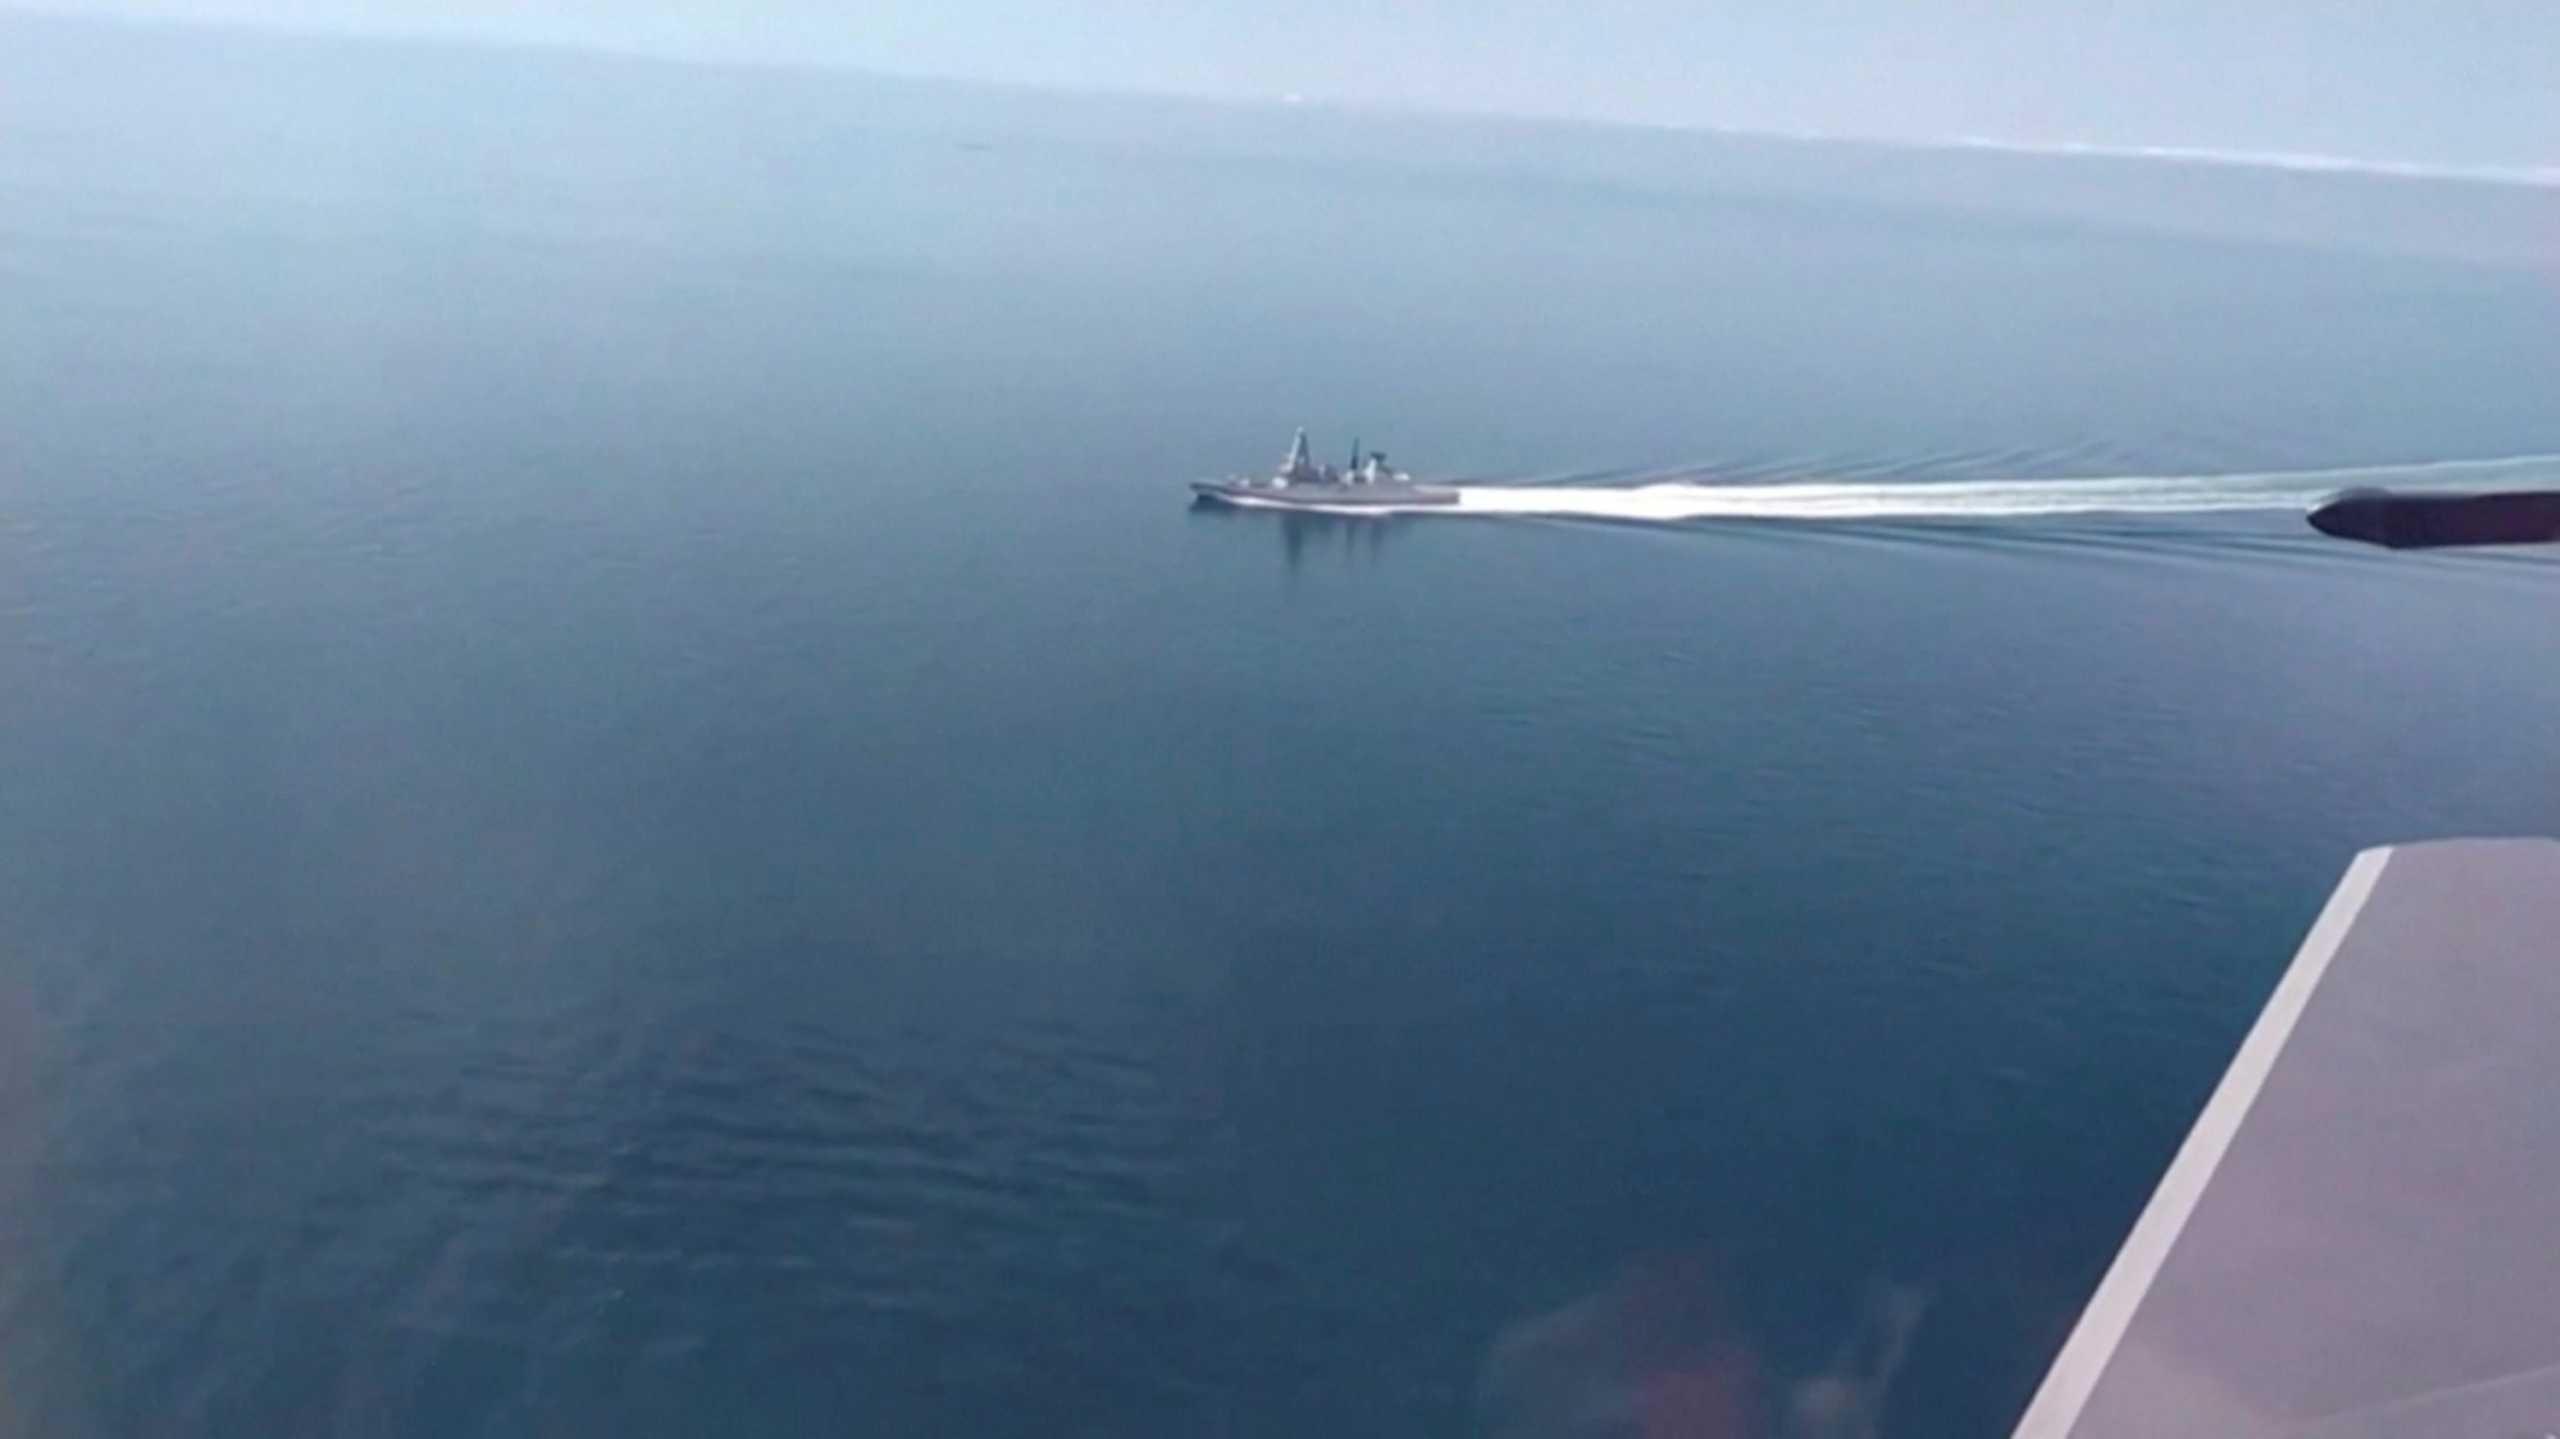 HMS Defender: «Μήνυμα» Βρετανών στη Ρωσία – Δεν δεχόμαστε ανάμιξη στην αβλαβή διέλευση